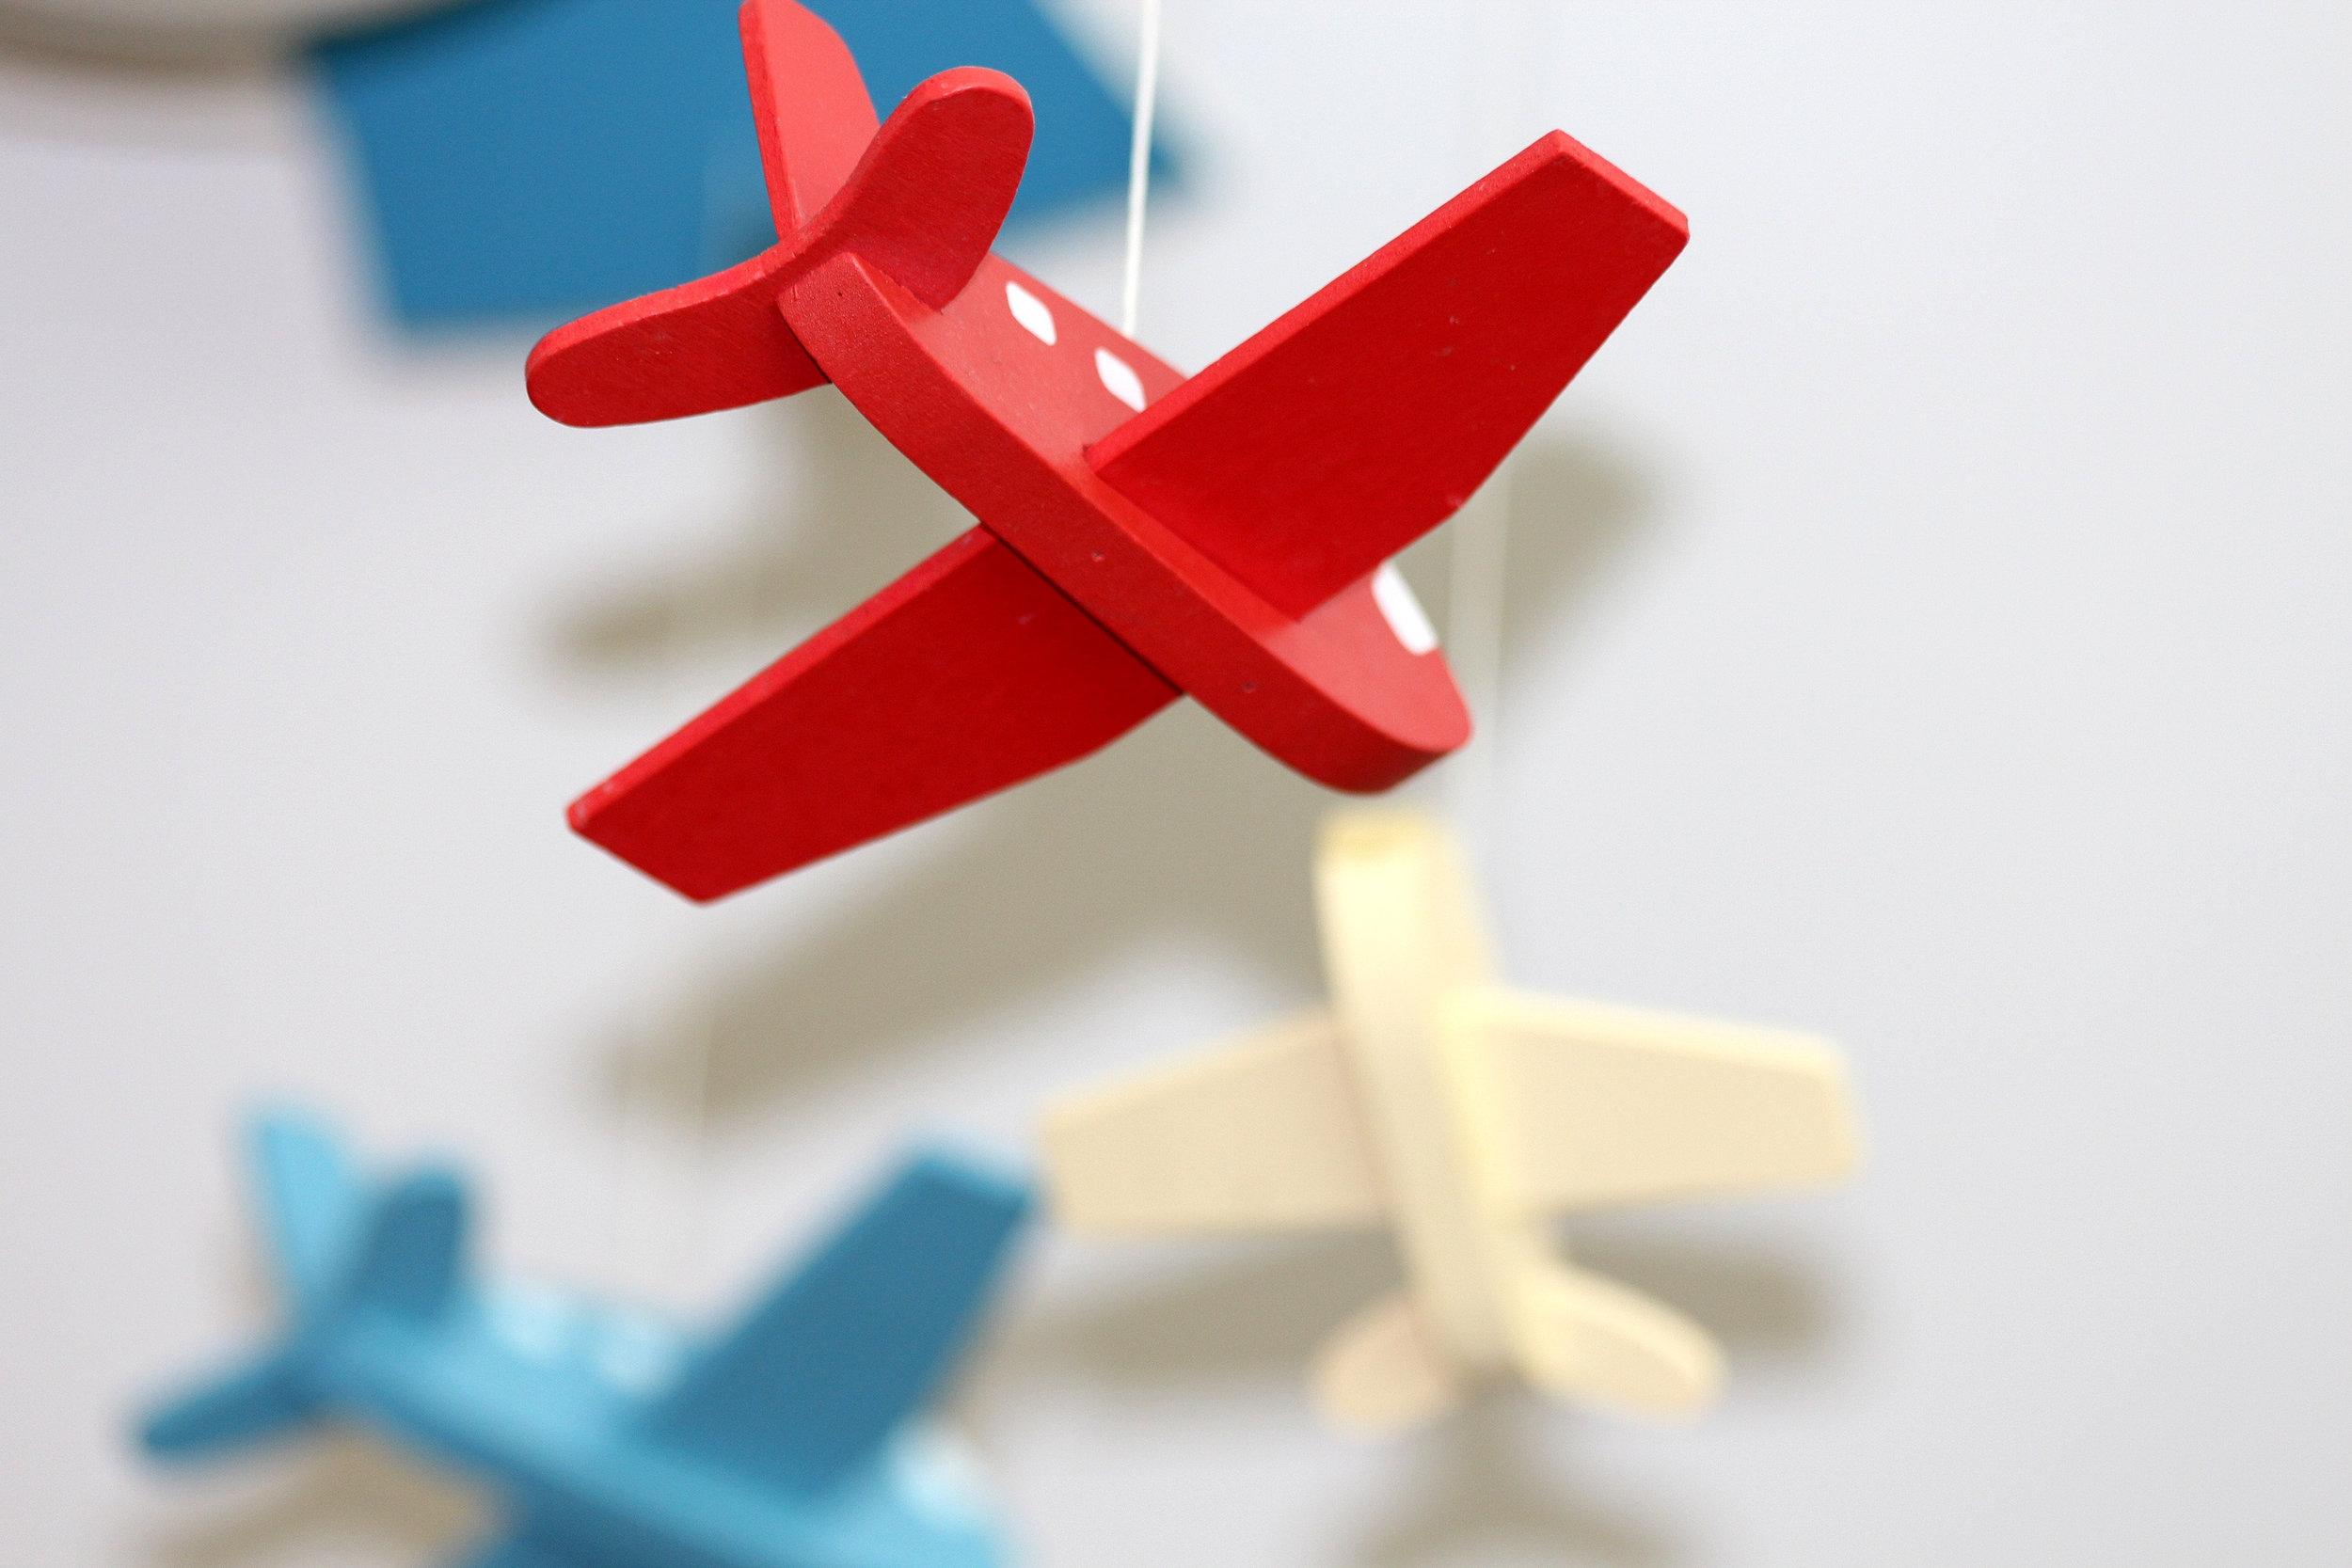 Canva - Miniature of a Plane_edited.jpg